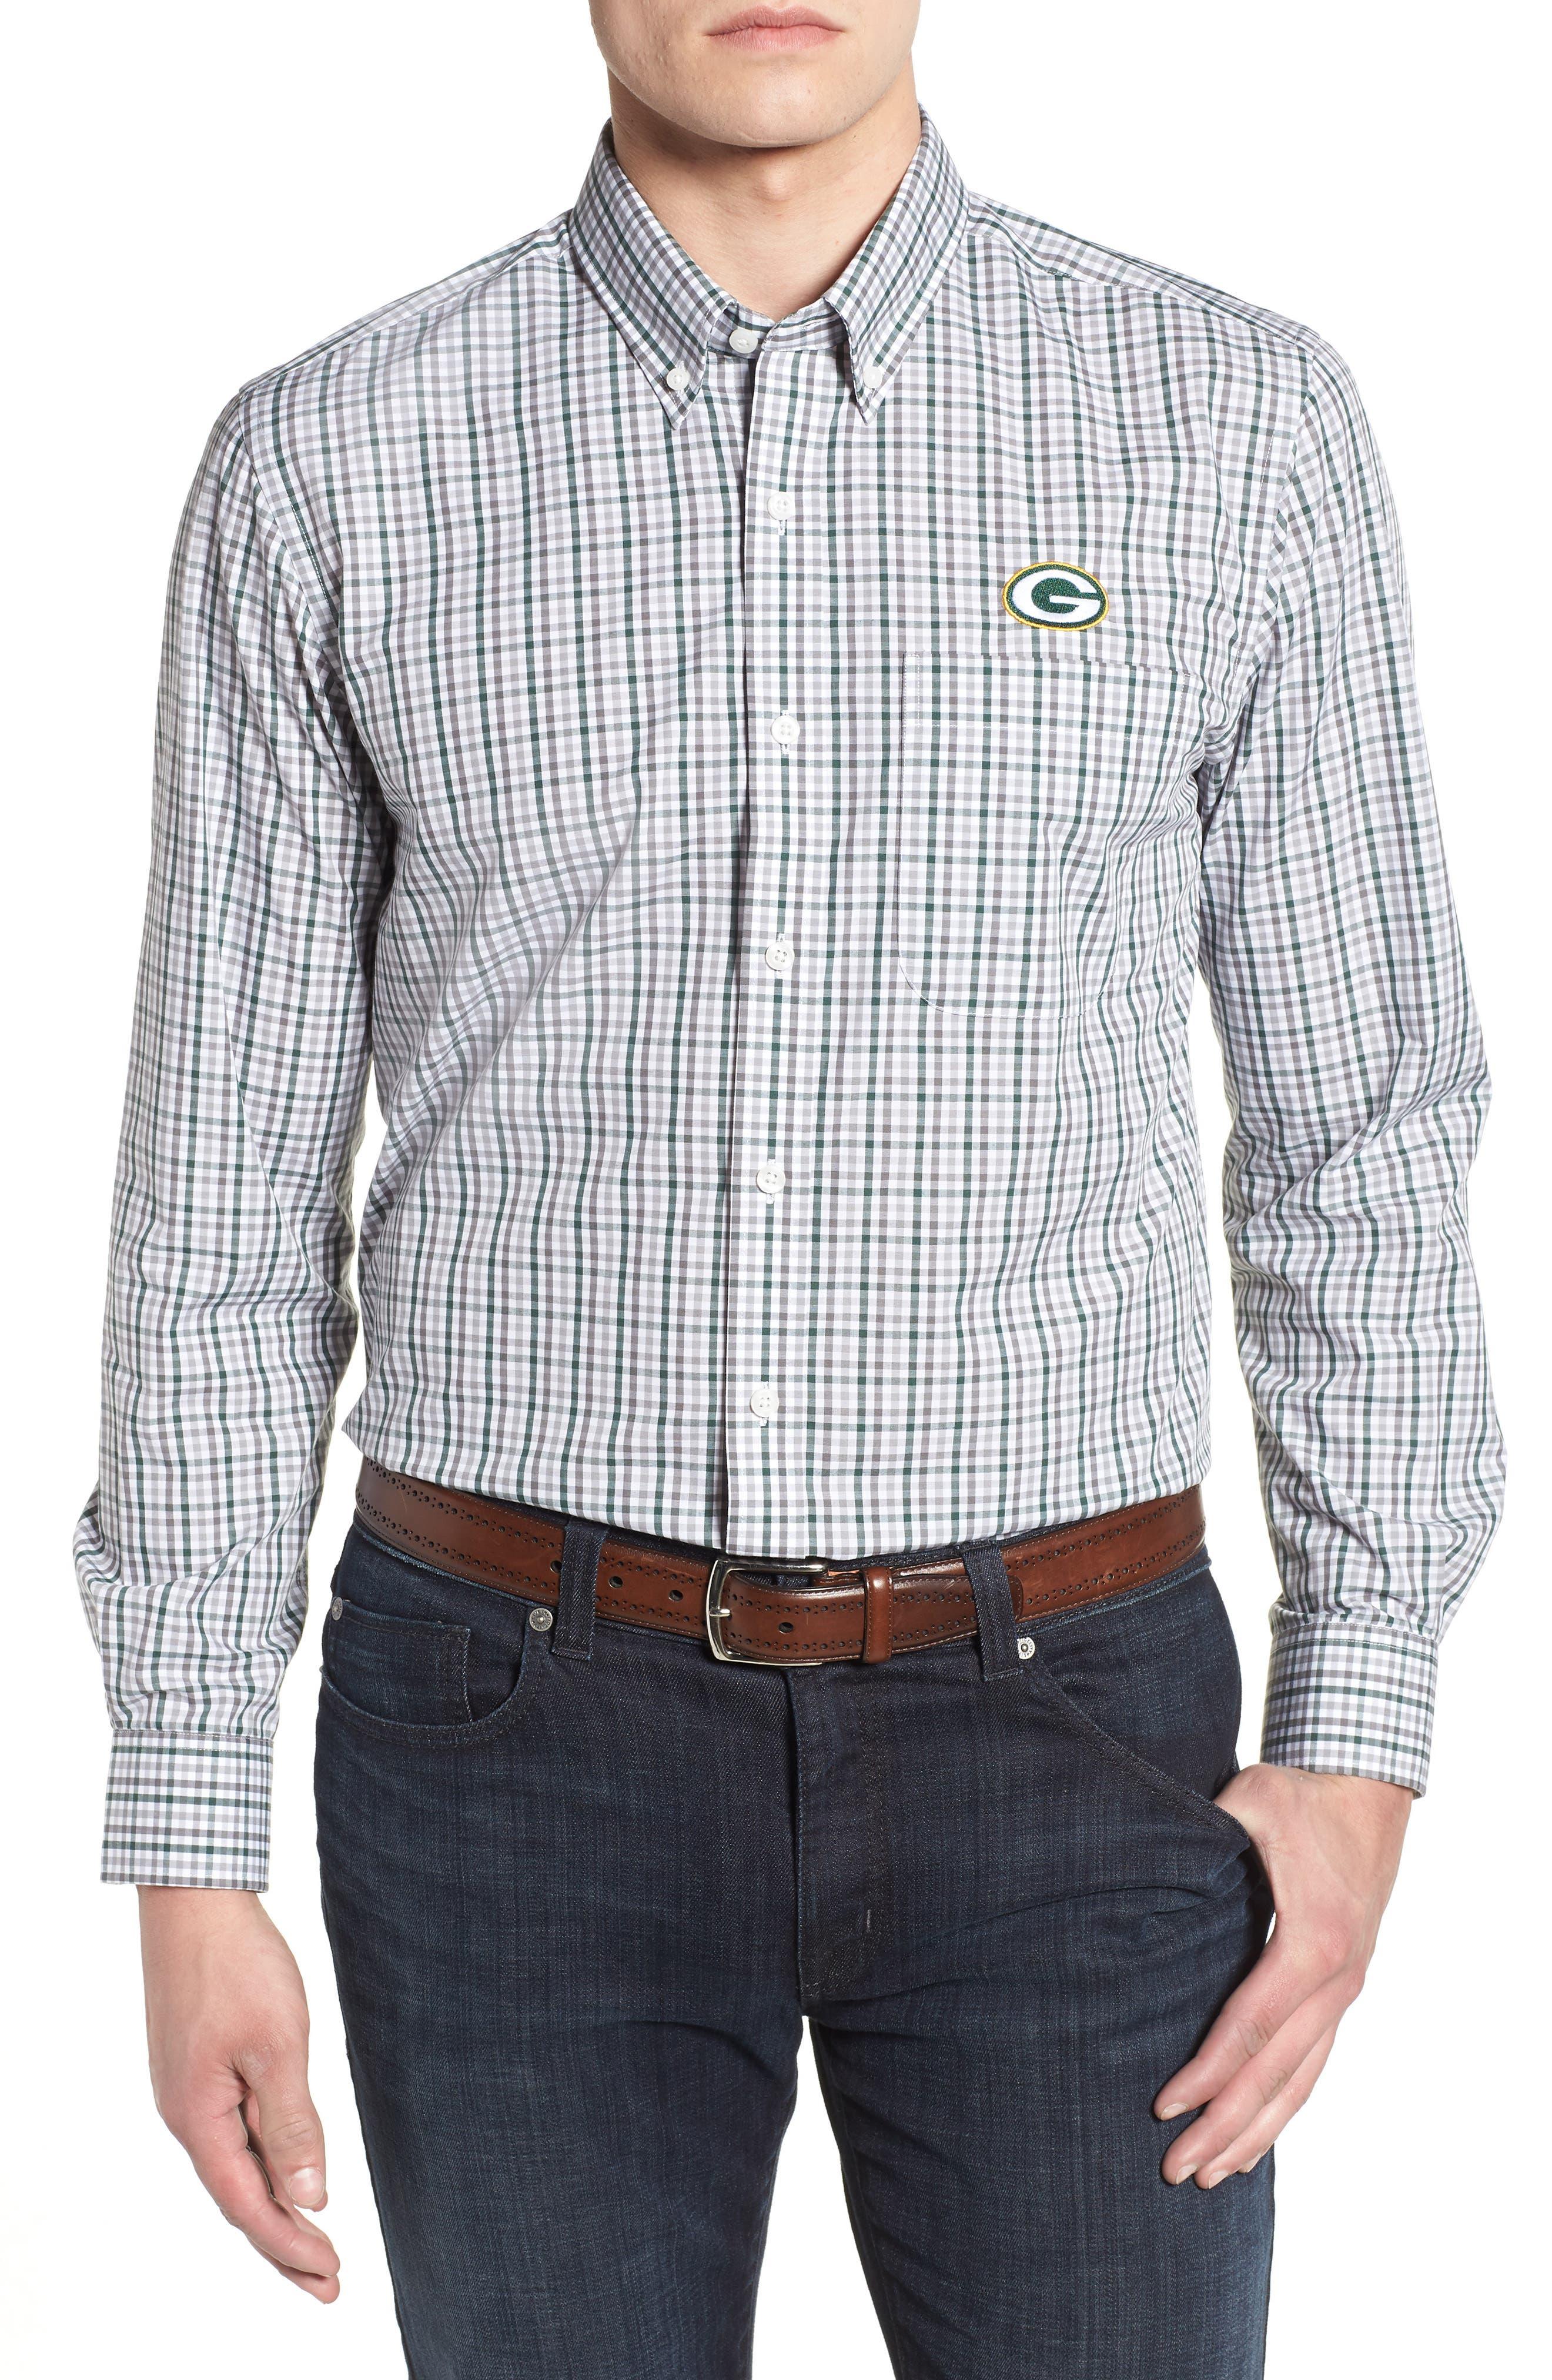 Green Bay Packers - Gilman Regular Fit Plaid Sport Shirt,                         Main,                         color, HUNTER